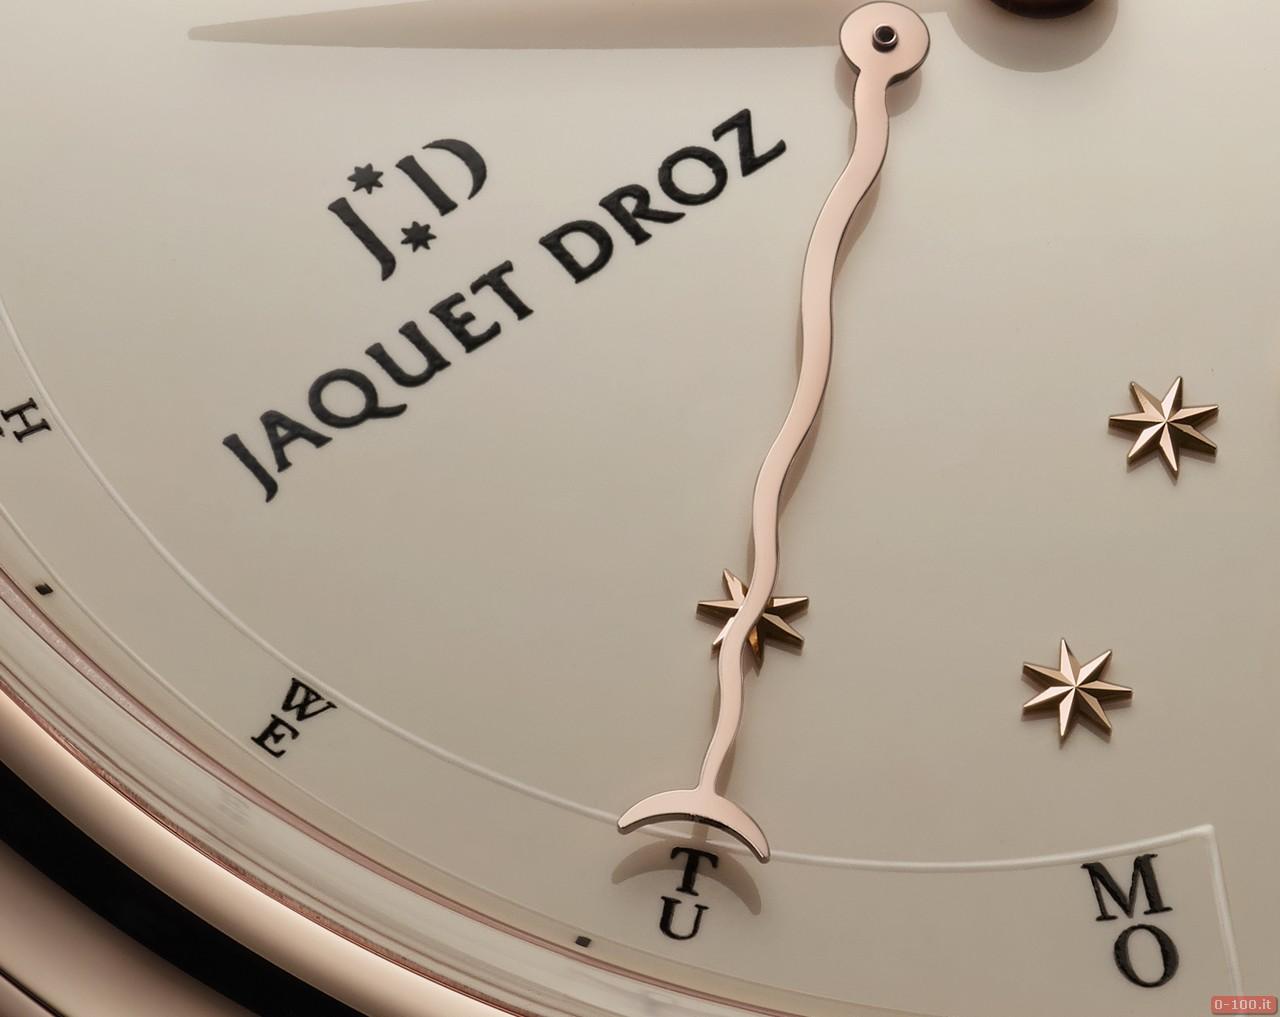 jaquet-droz-perpetual-calendar-eclipse-1007